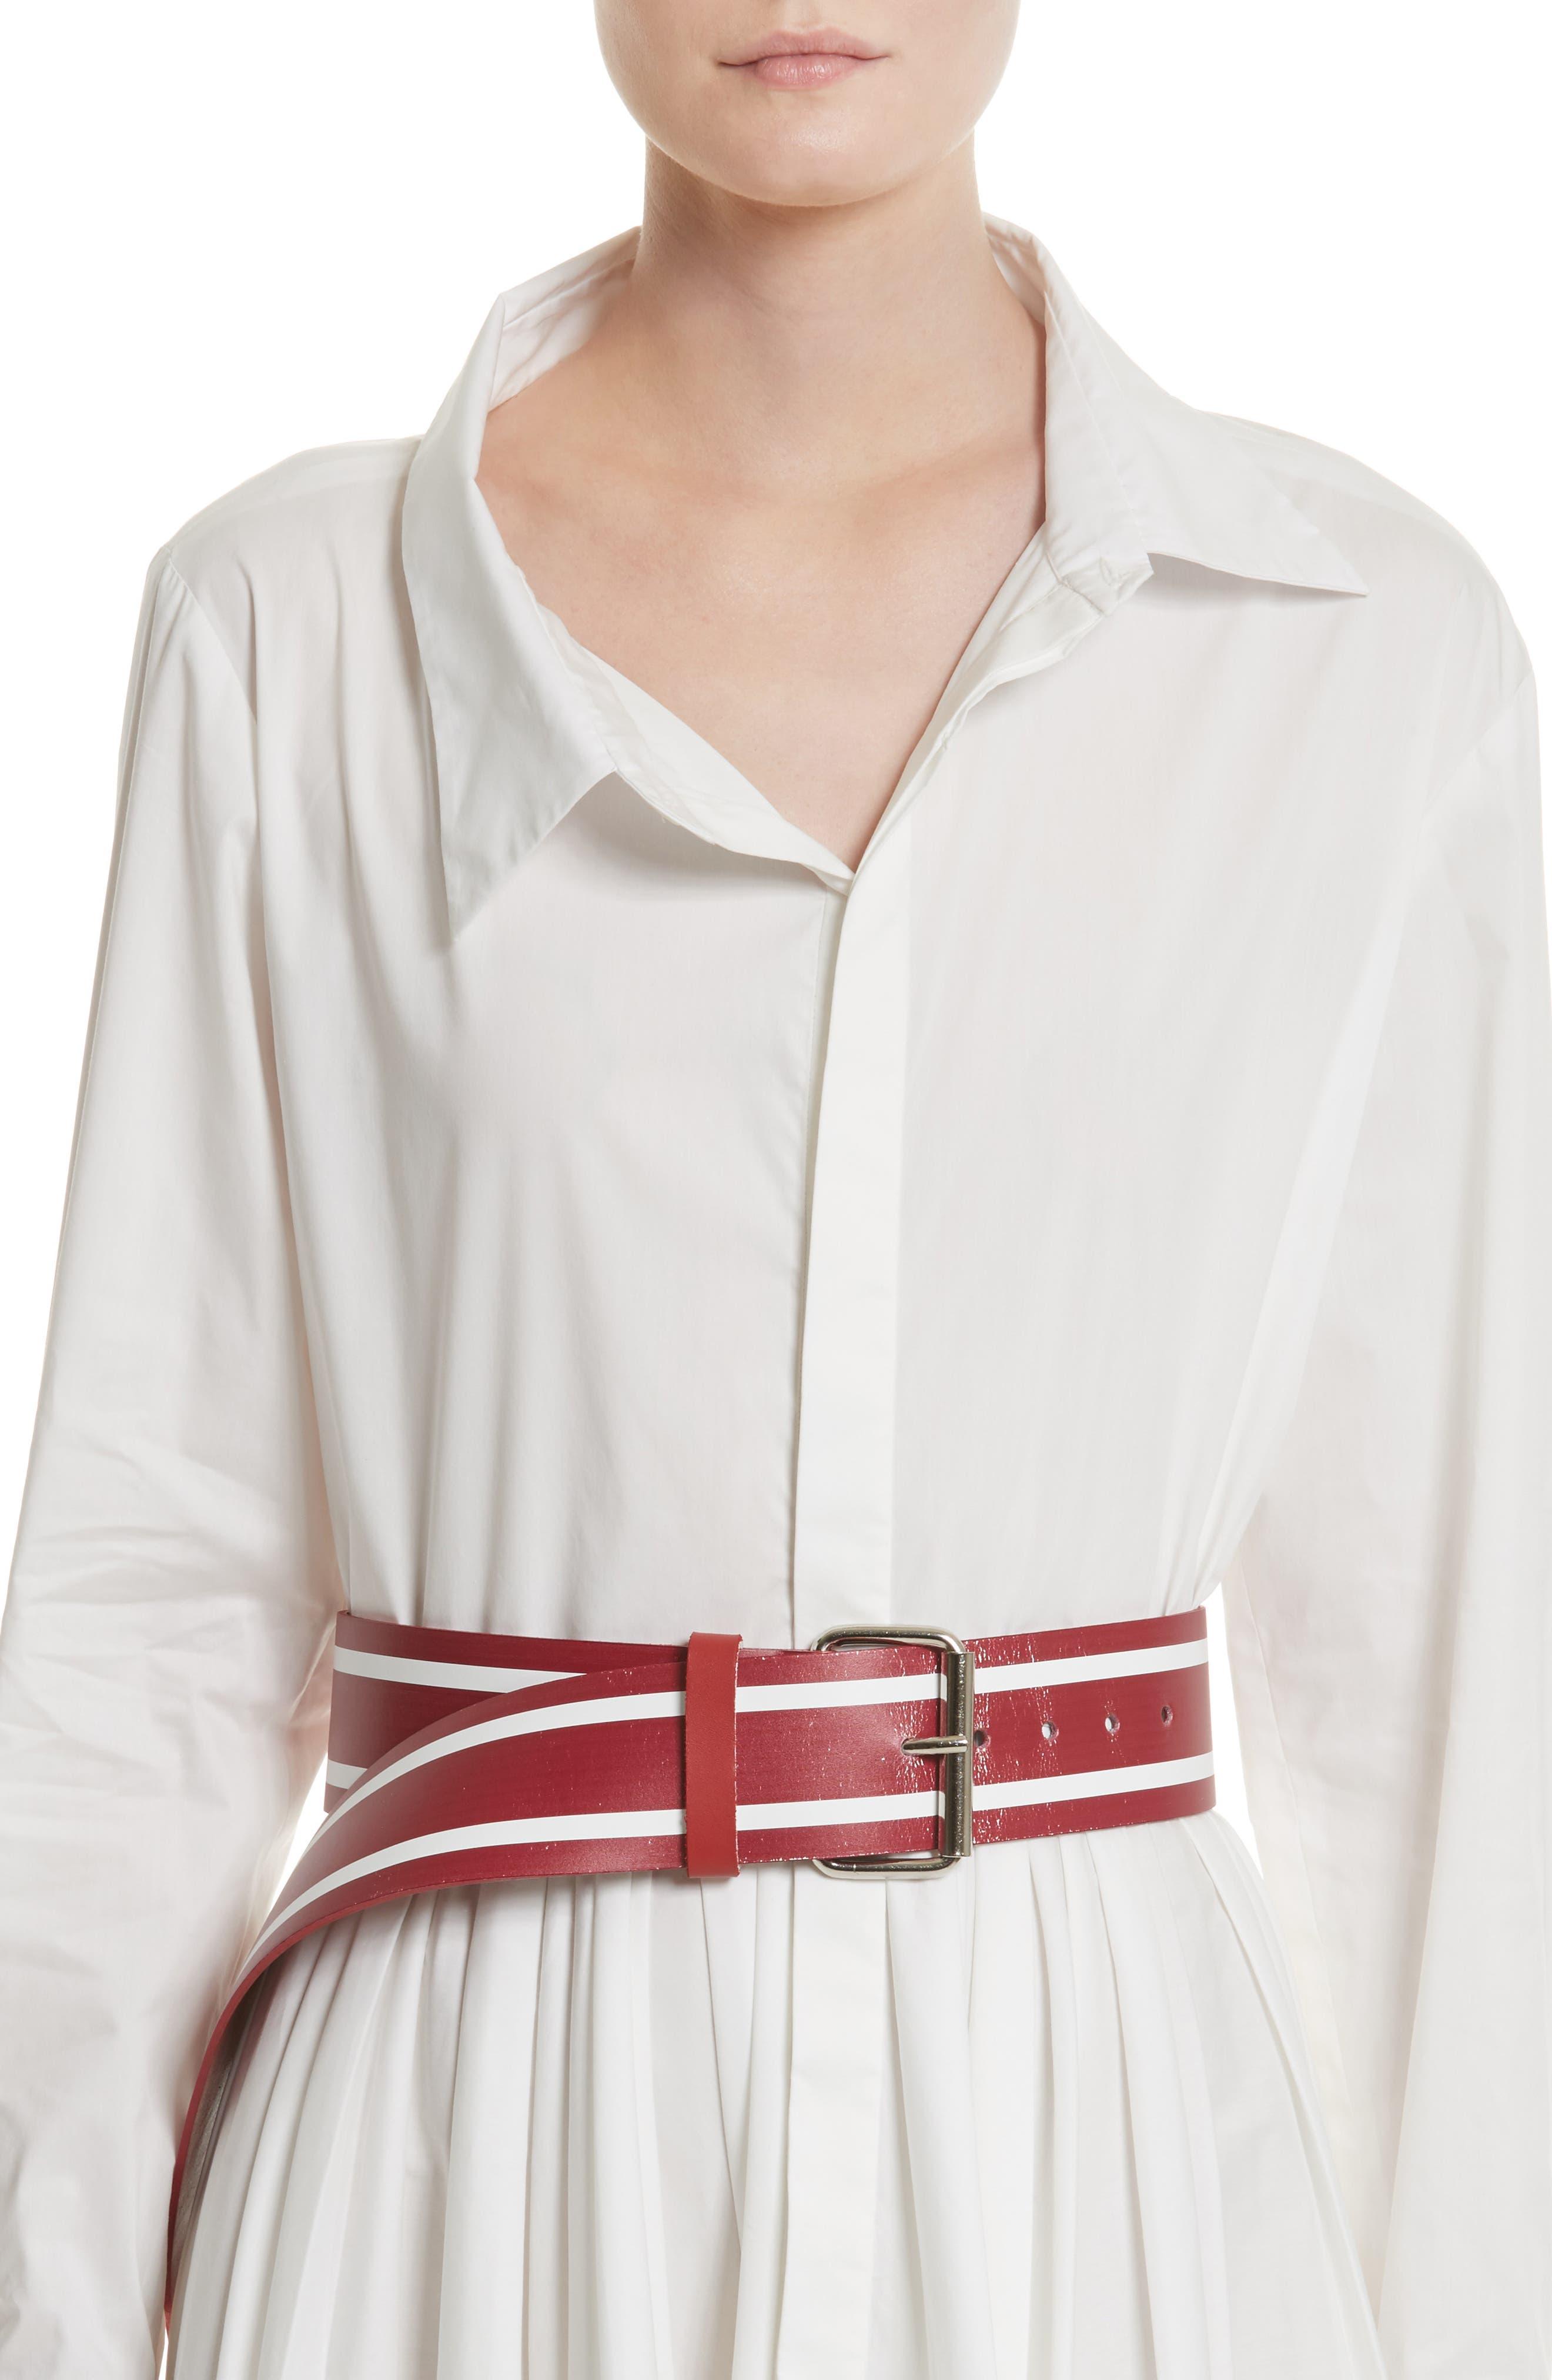 Alternate Image 2  - MONSE Racing Stripe Leather Belt